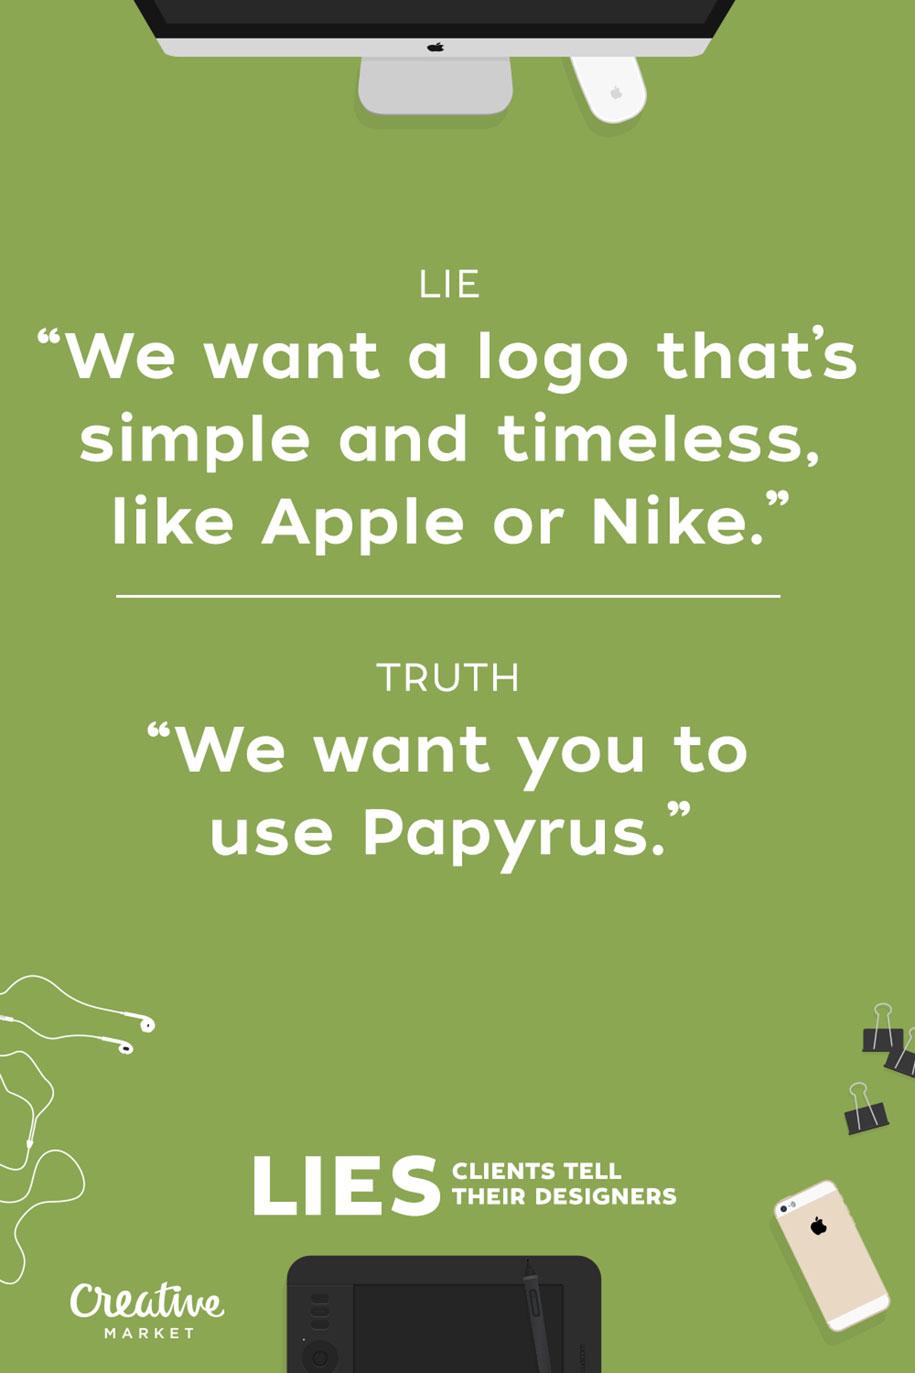 15-lies-clients-tell-designers-joshua-johnson-creative-market-11